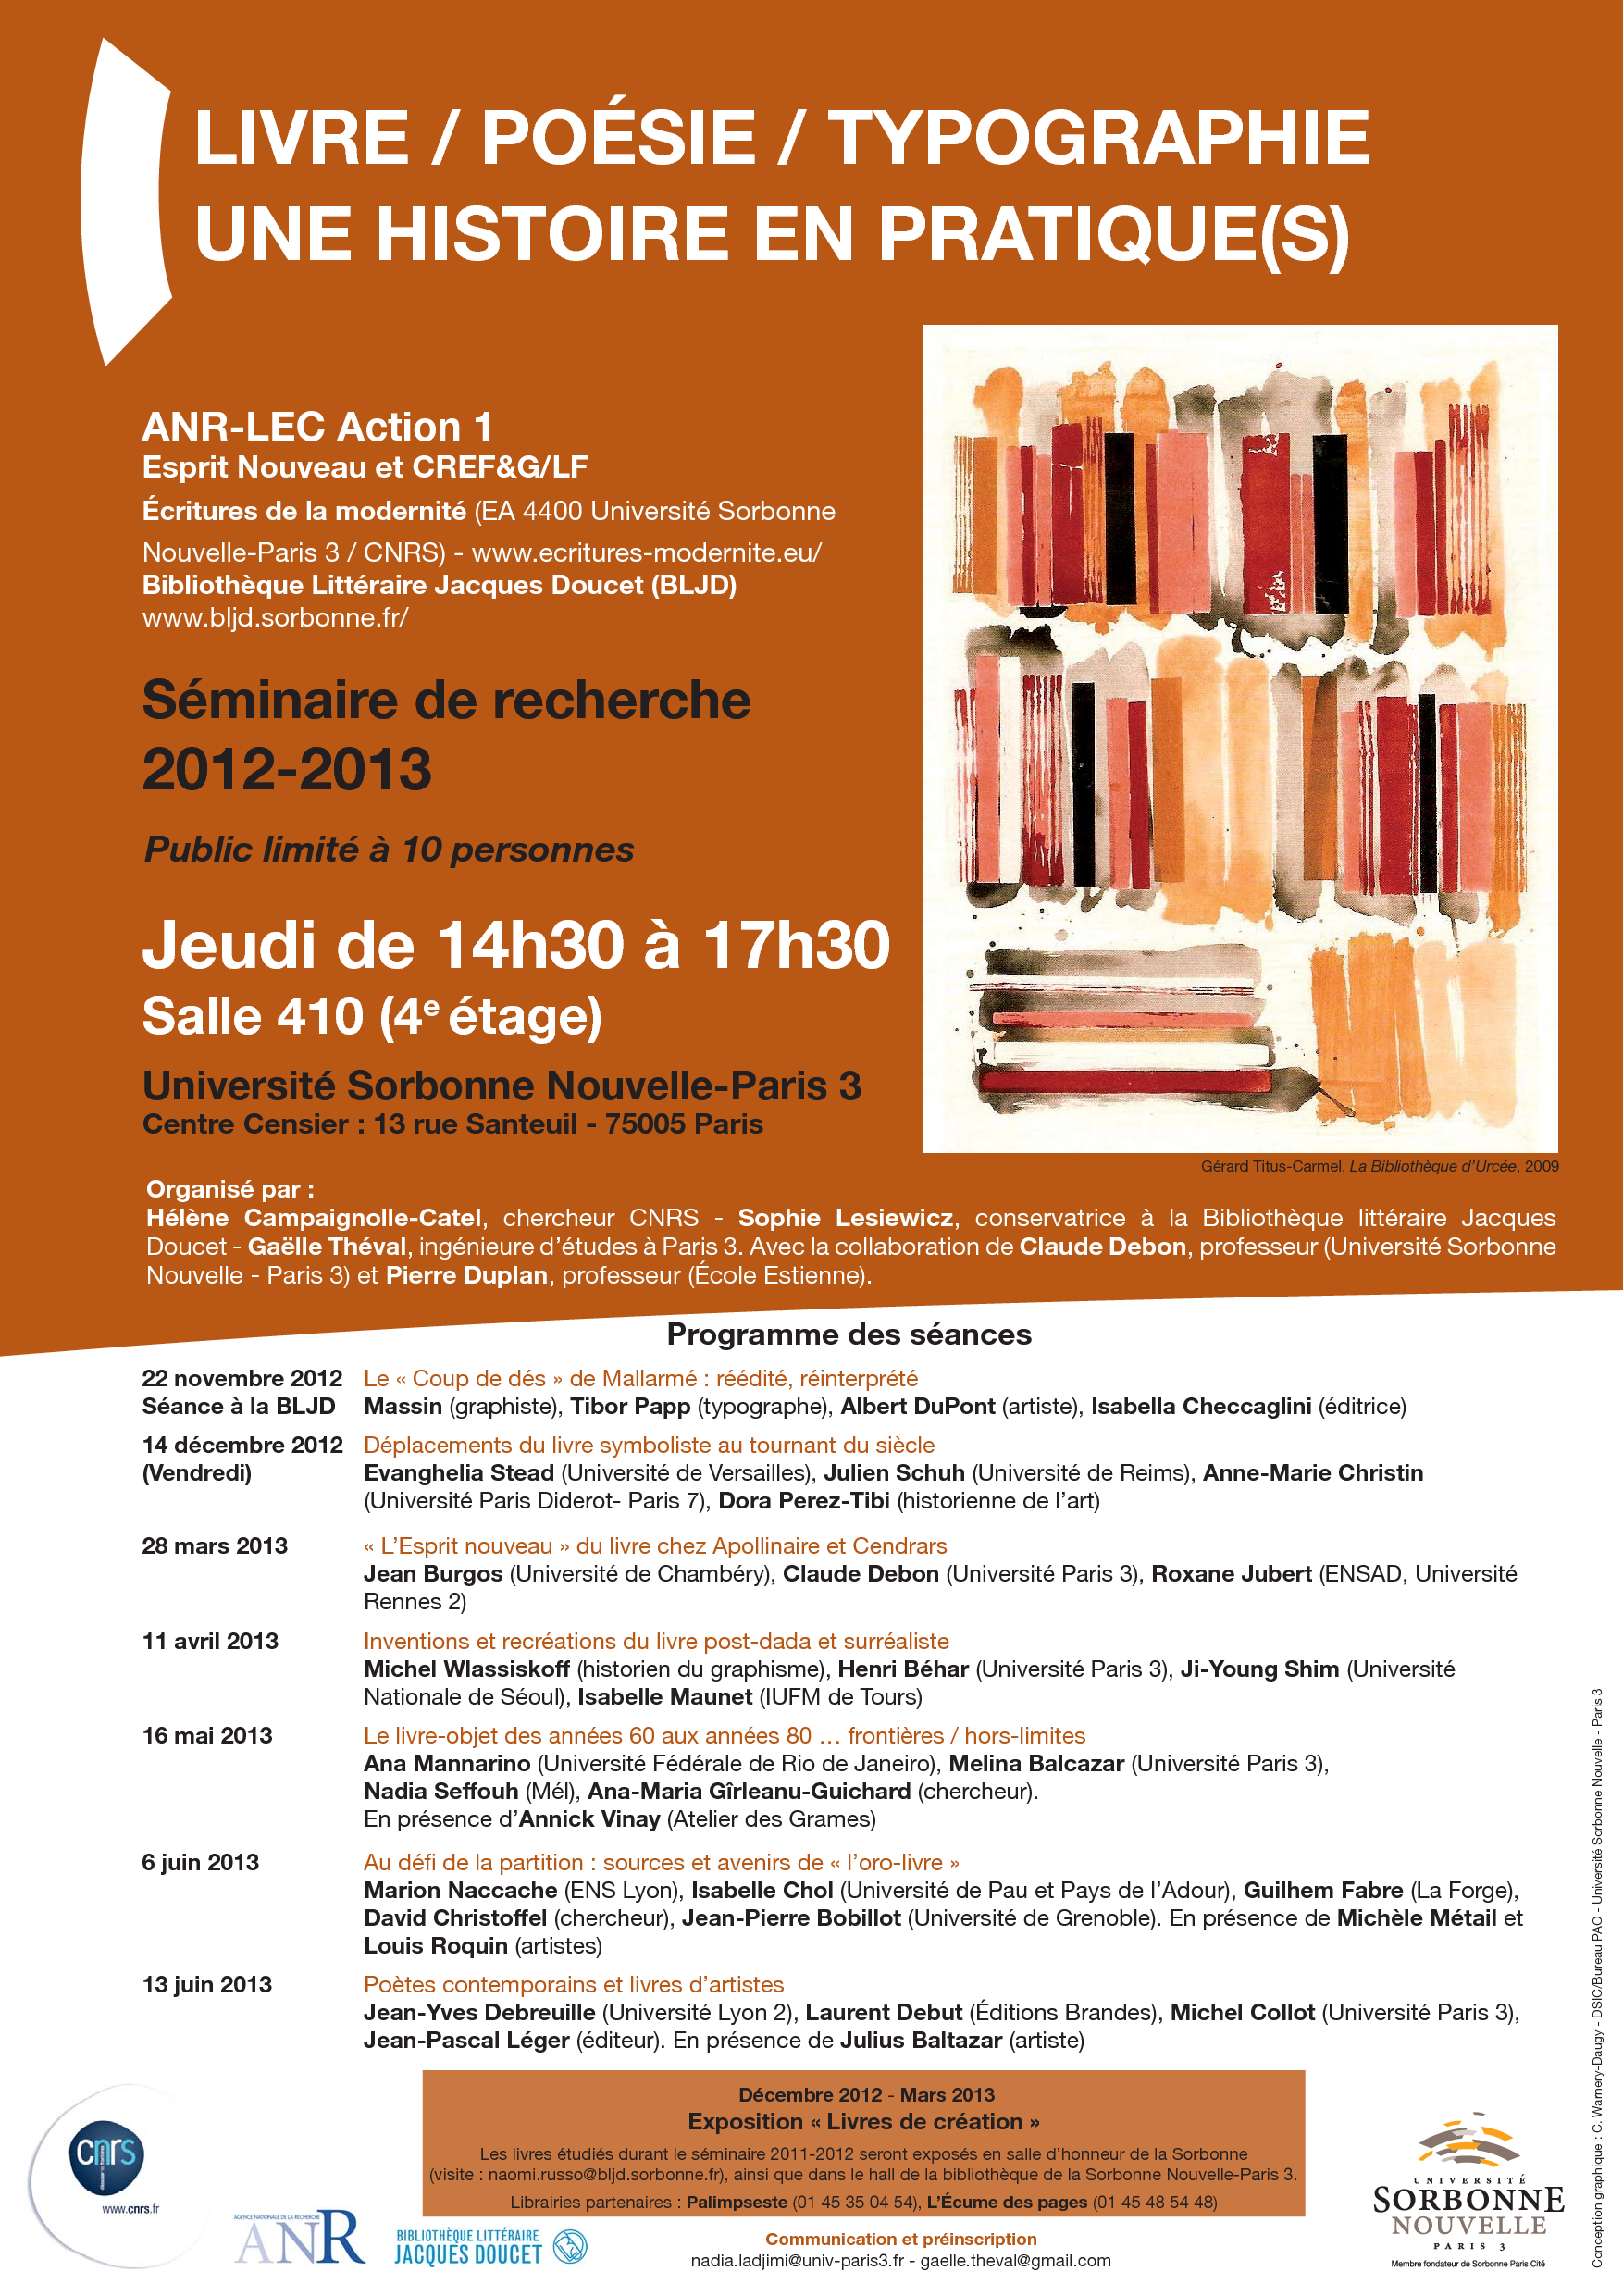 rencontres doctorales paris diderot